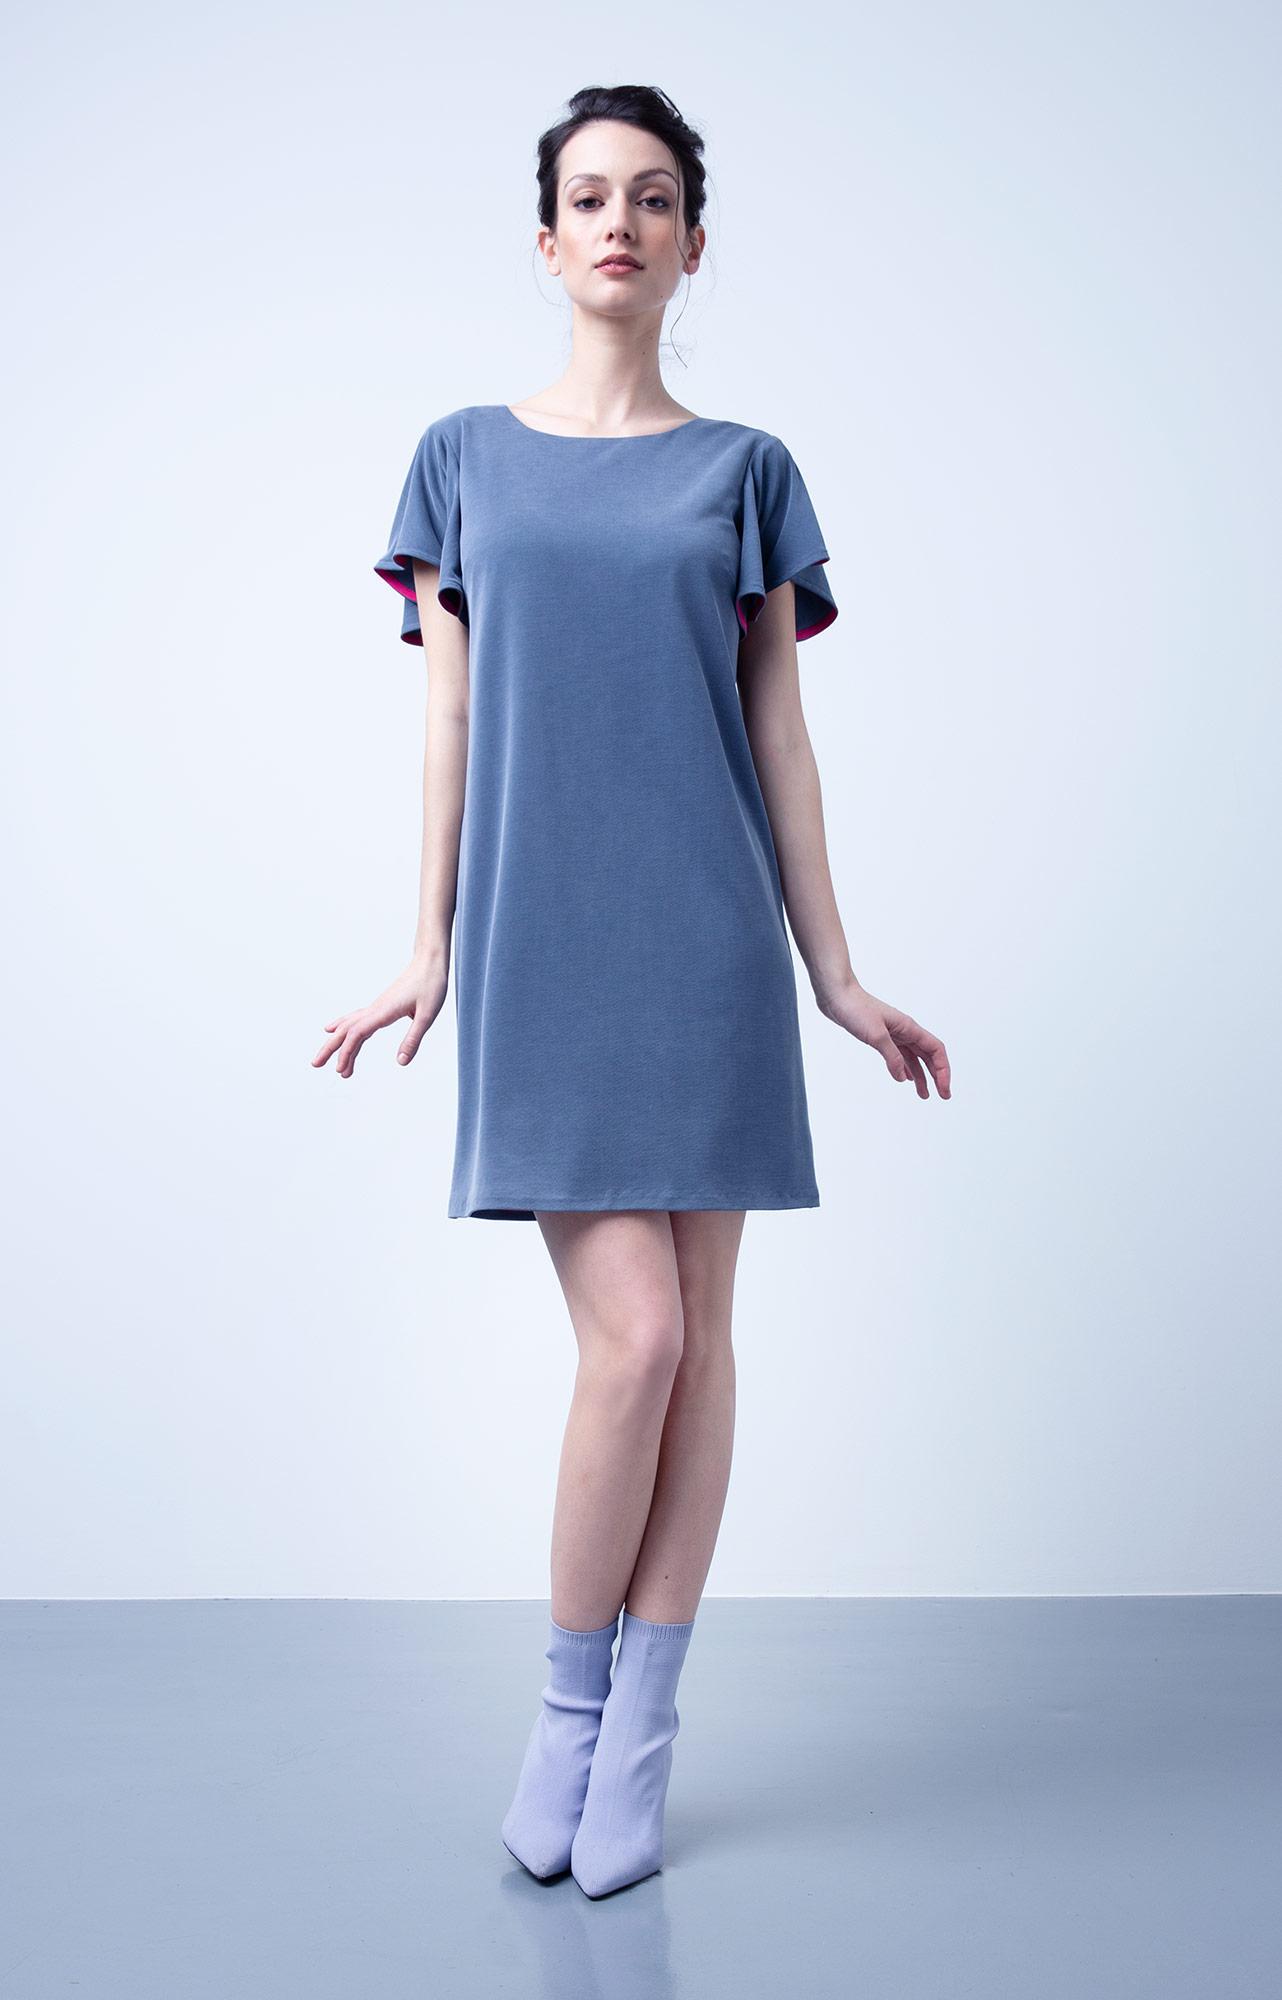 Frühjahr/Sommer Kollektion 2019 Coco Lores Sommerkleid Jeansblau